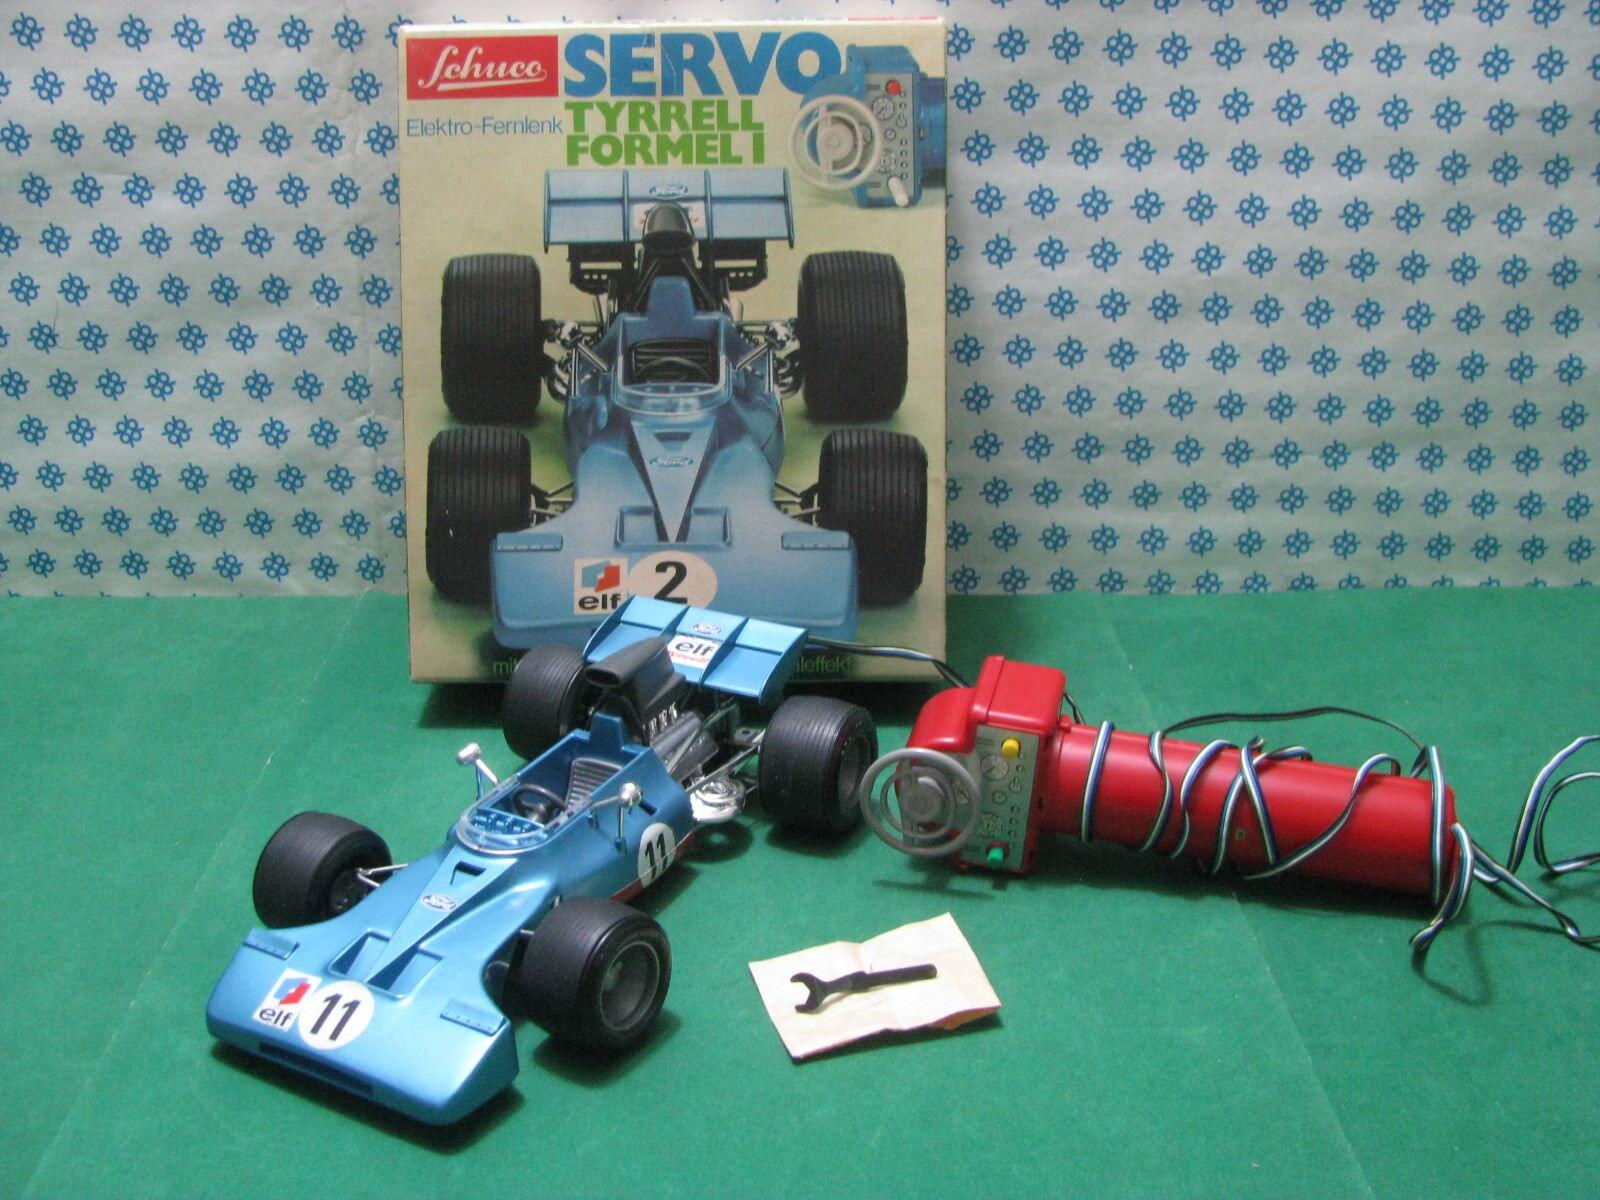 RARE  Vintage SCHUCO SERVO  - TYRREL  Formel 1  - Elektro-Fernlenk 356 217